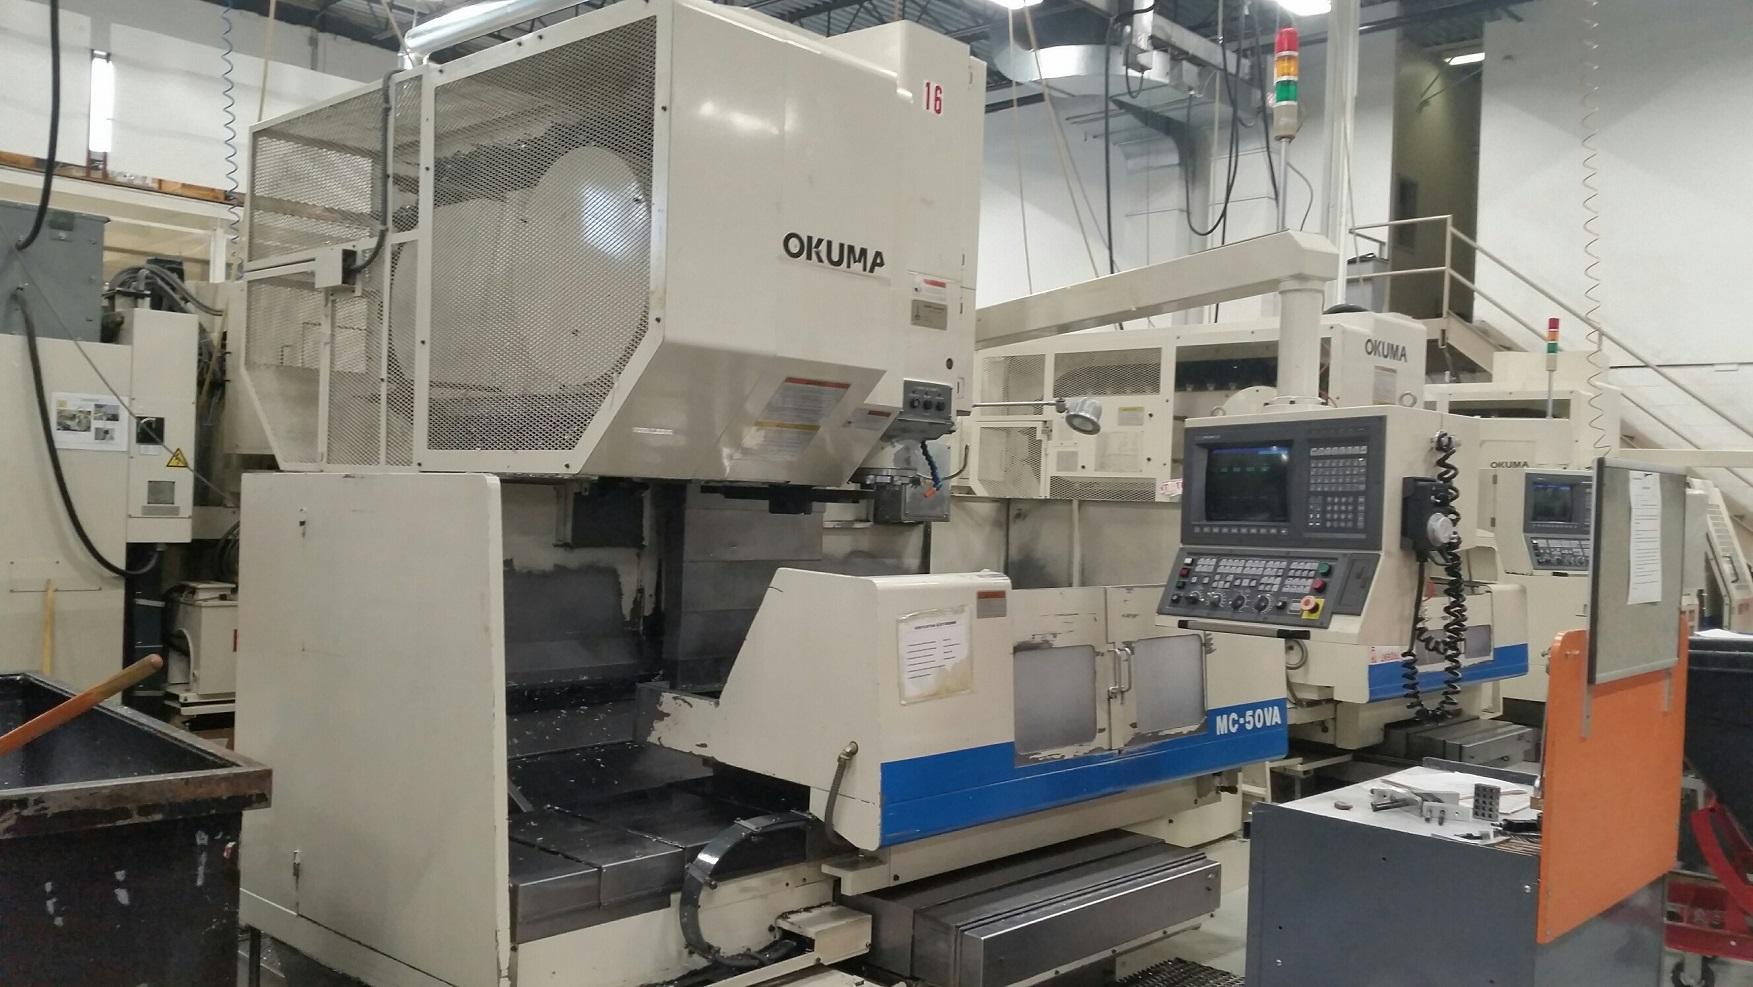 "OKUMA MC-50VA CNC VERTICAL MACHINING CENTER, OSP 7000, 41""/20""/22"" Travels, 32 Position ATC, 5000 RPM, 50 Taper, DNC-B, Helical Cutting, 1998"